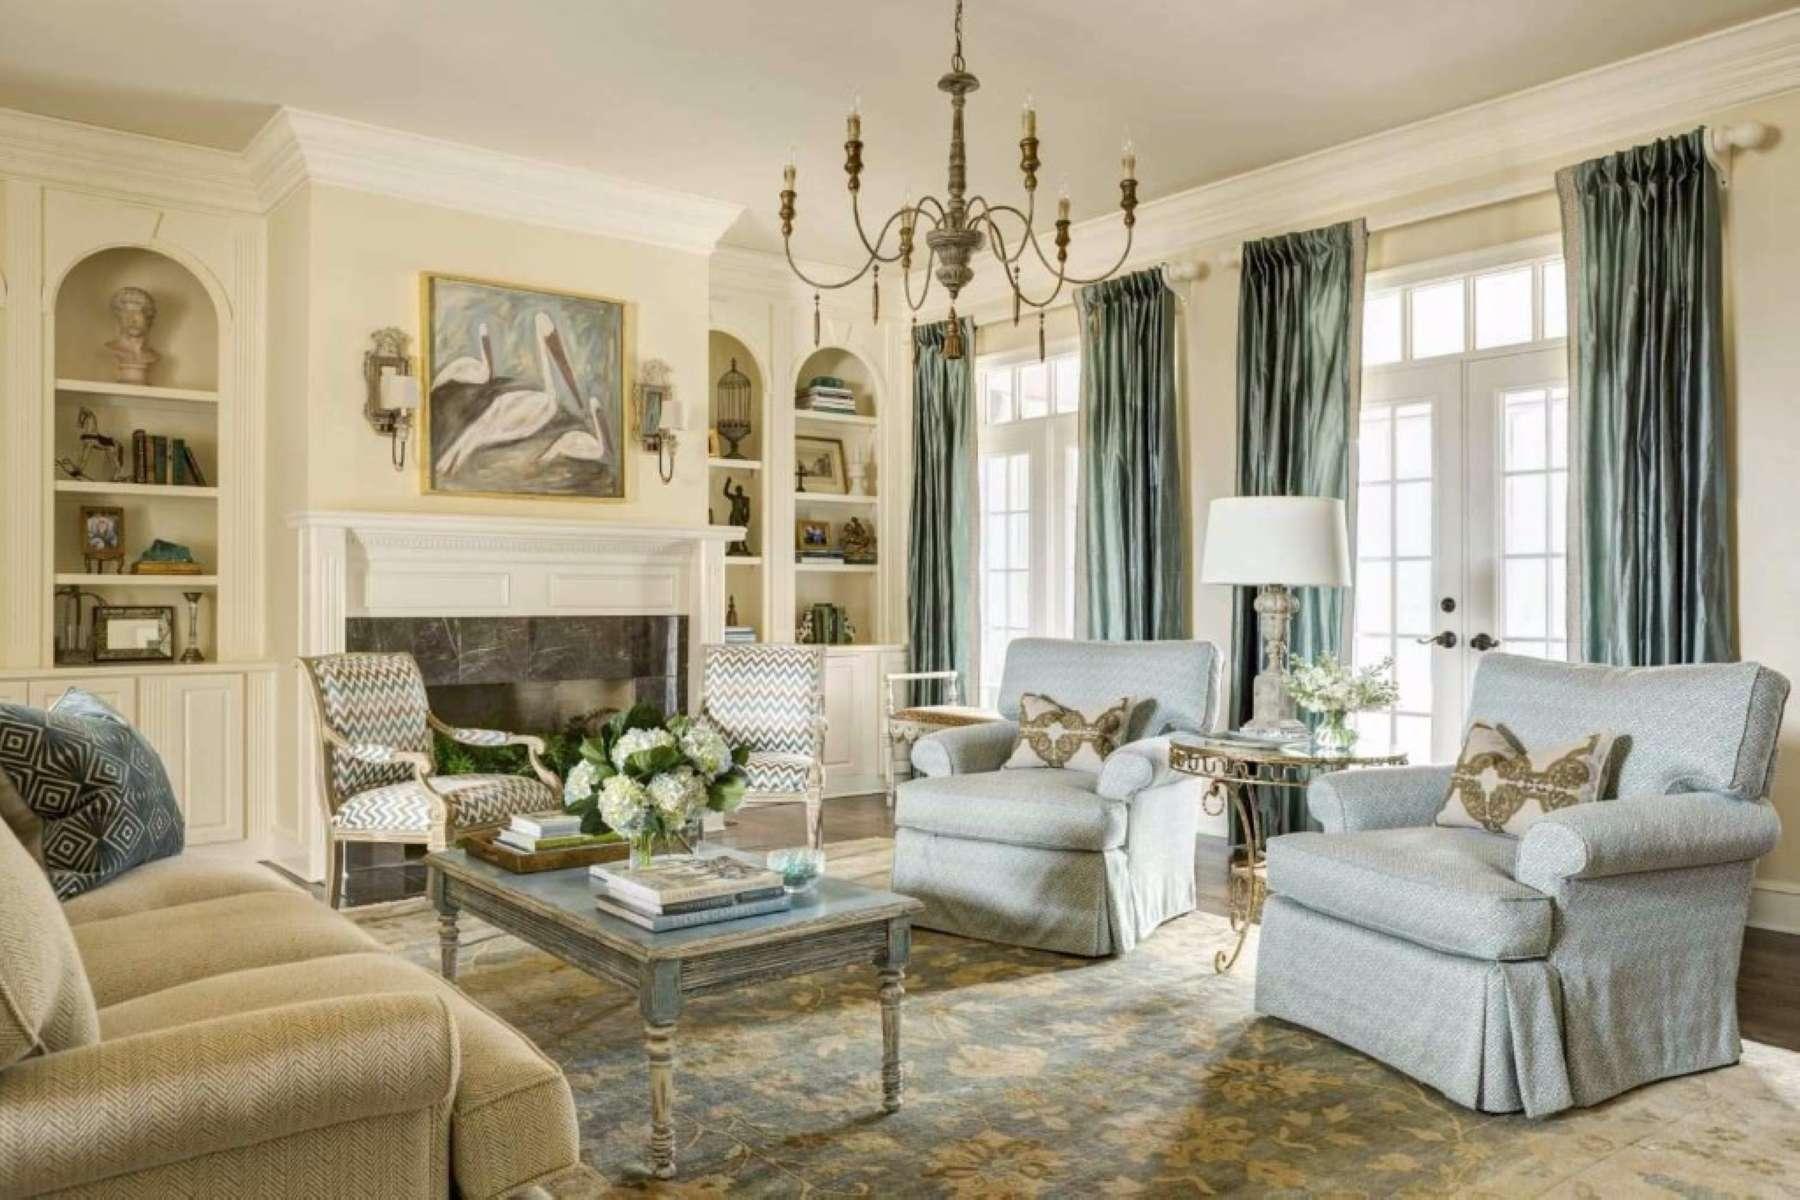 Arkansas-interior-design-Livable-Luxury-IMG_003